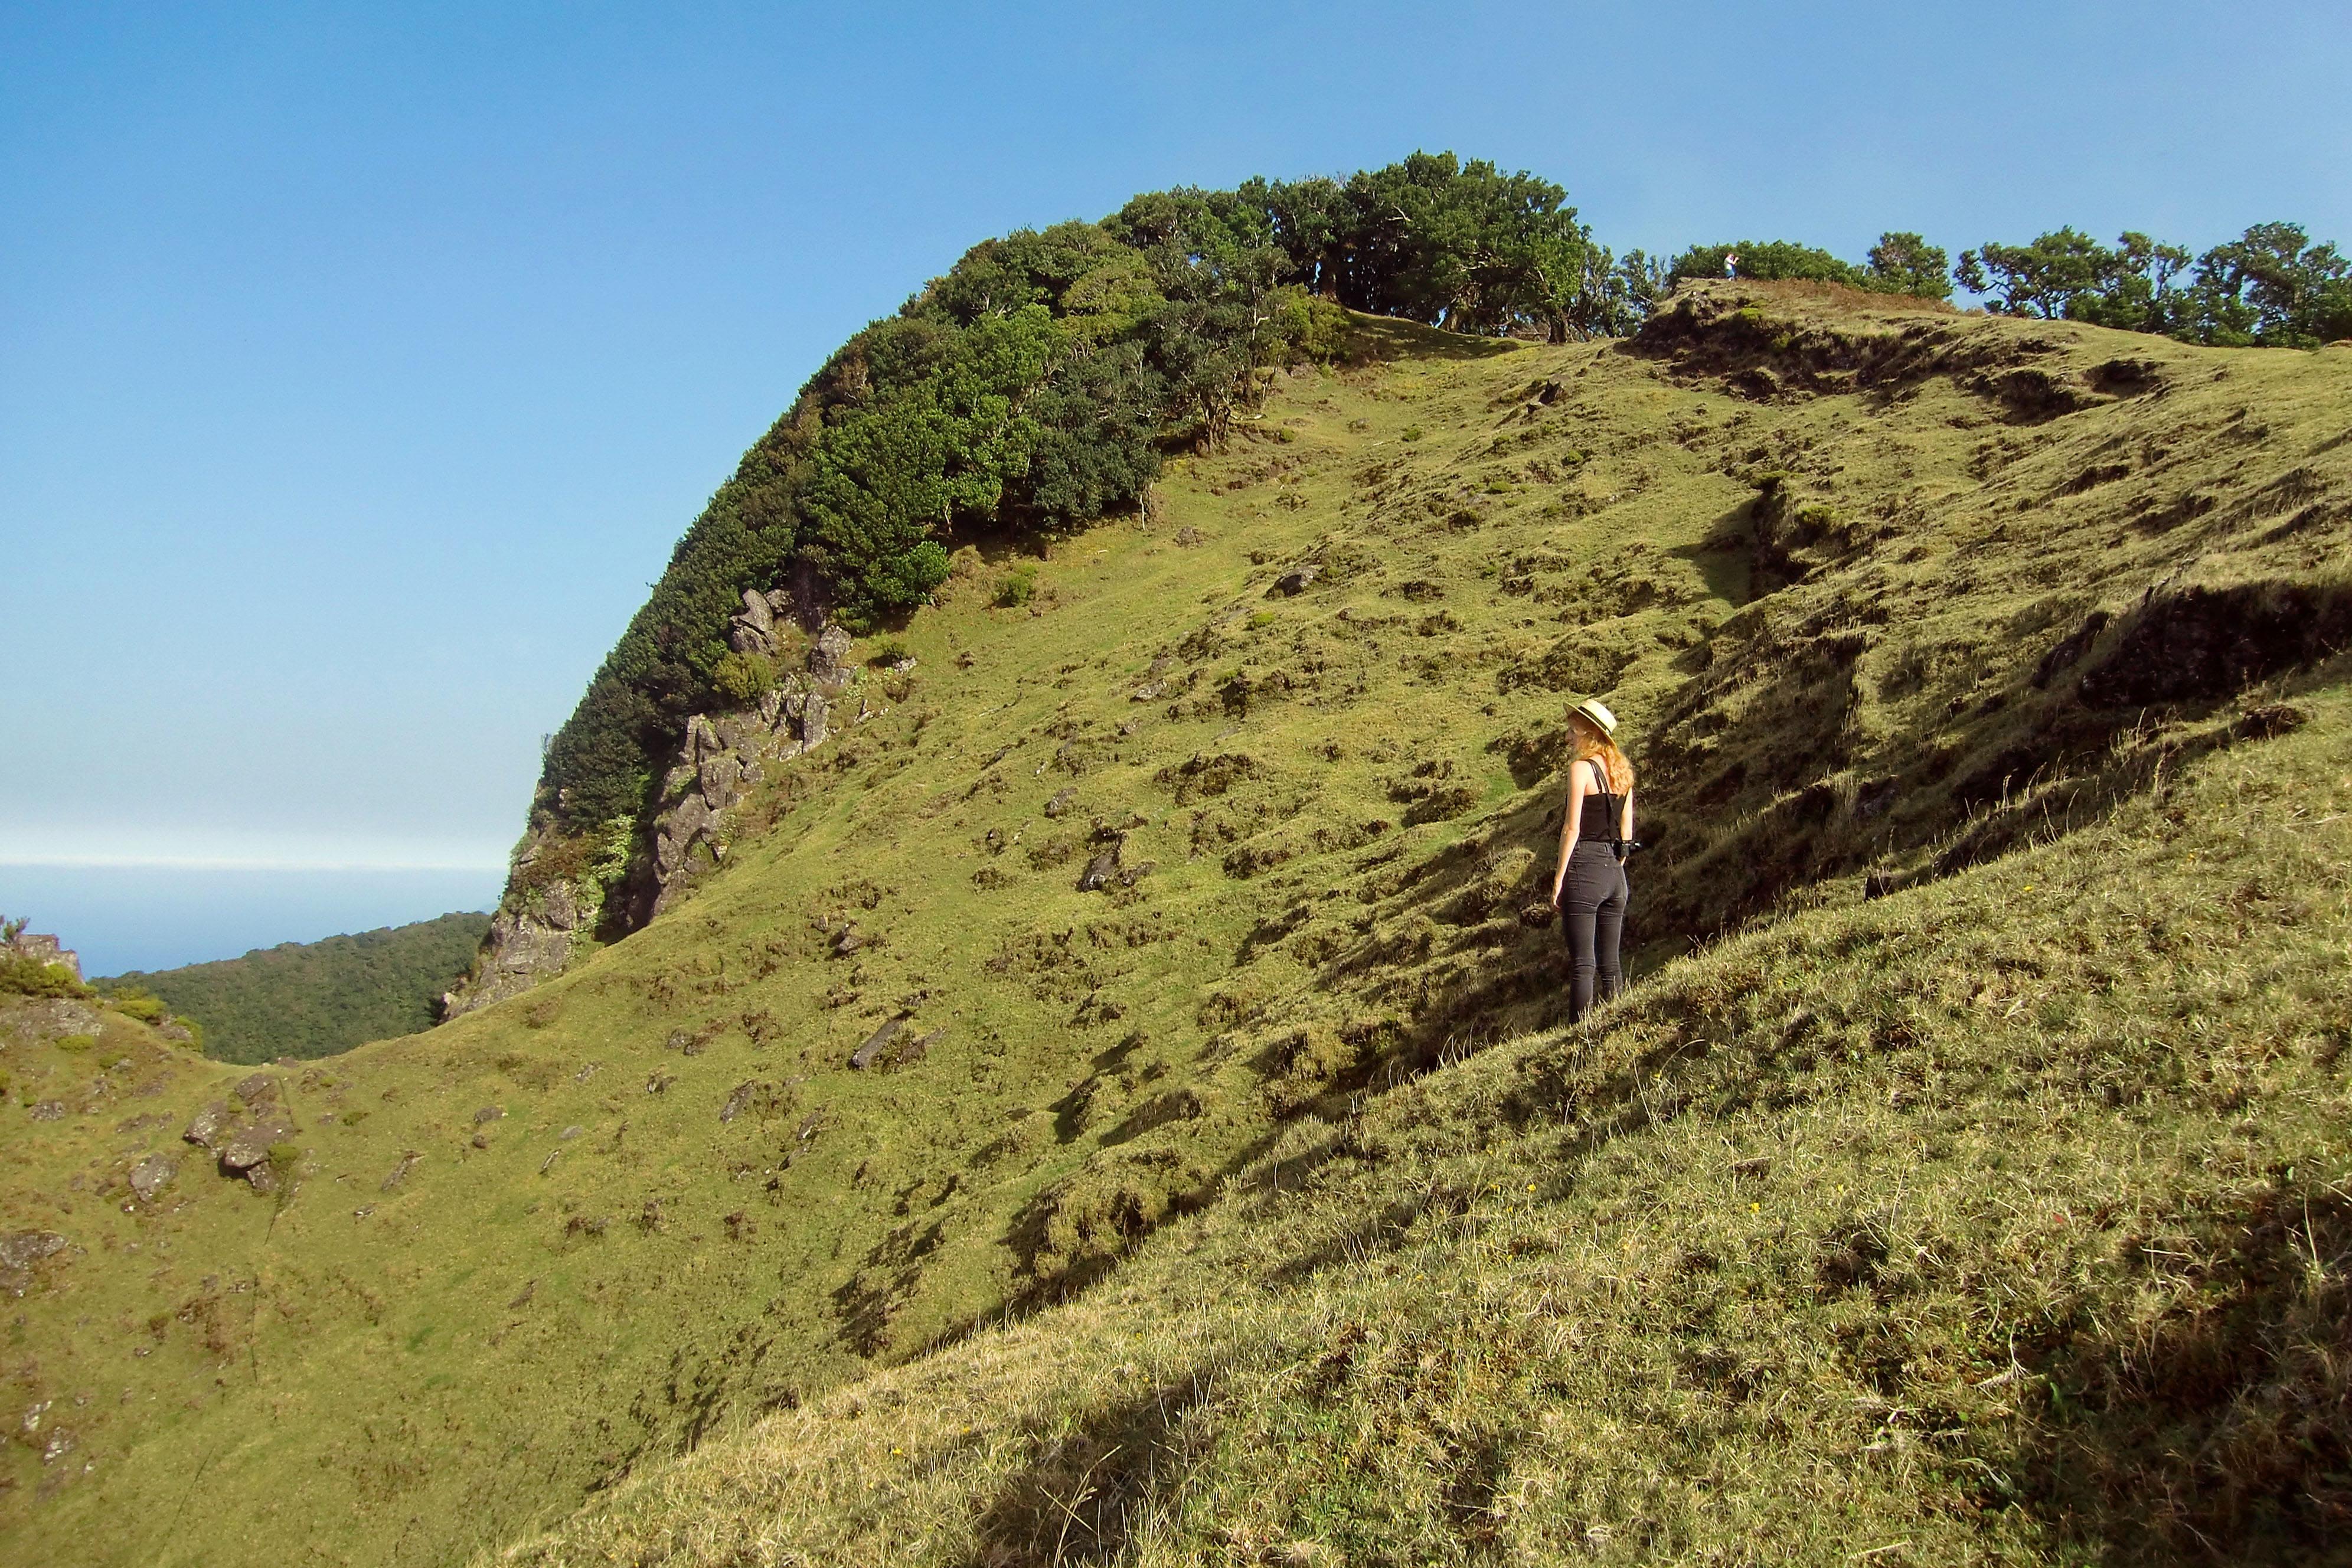 Madeira landscape vegan